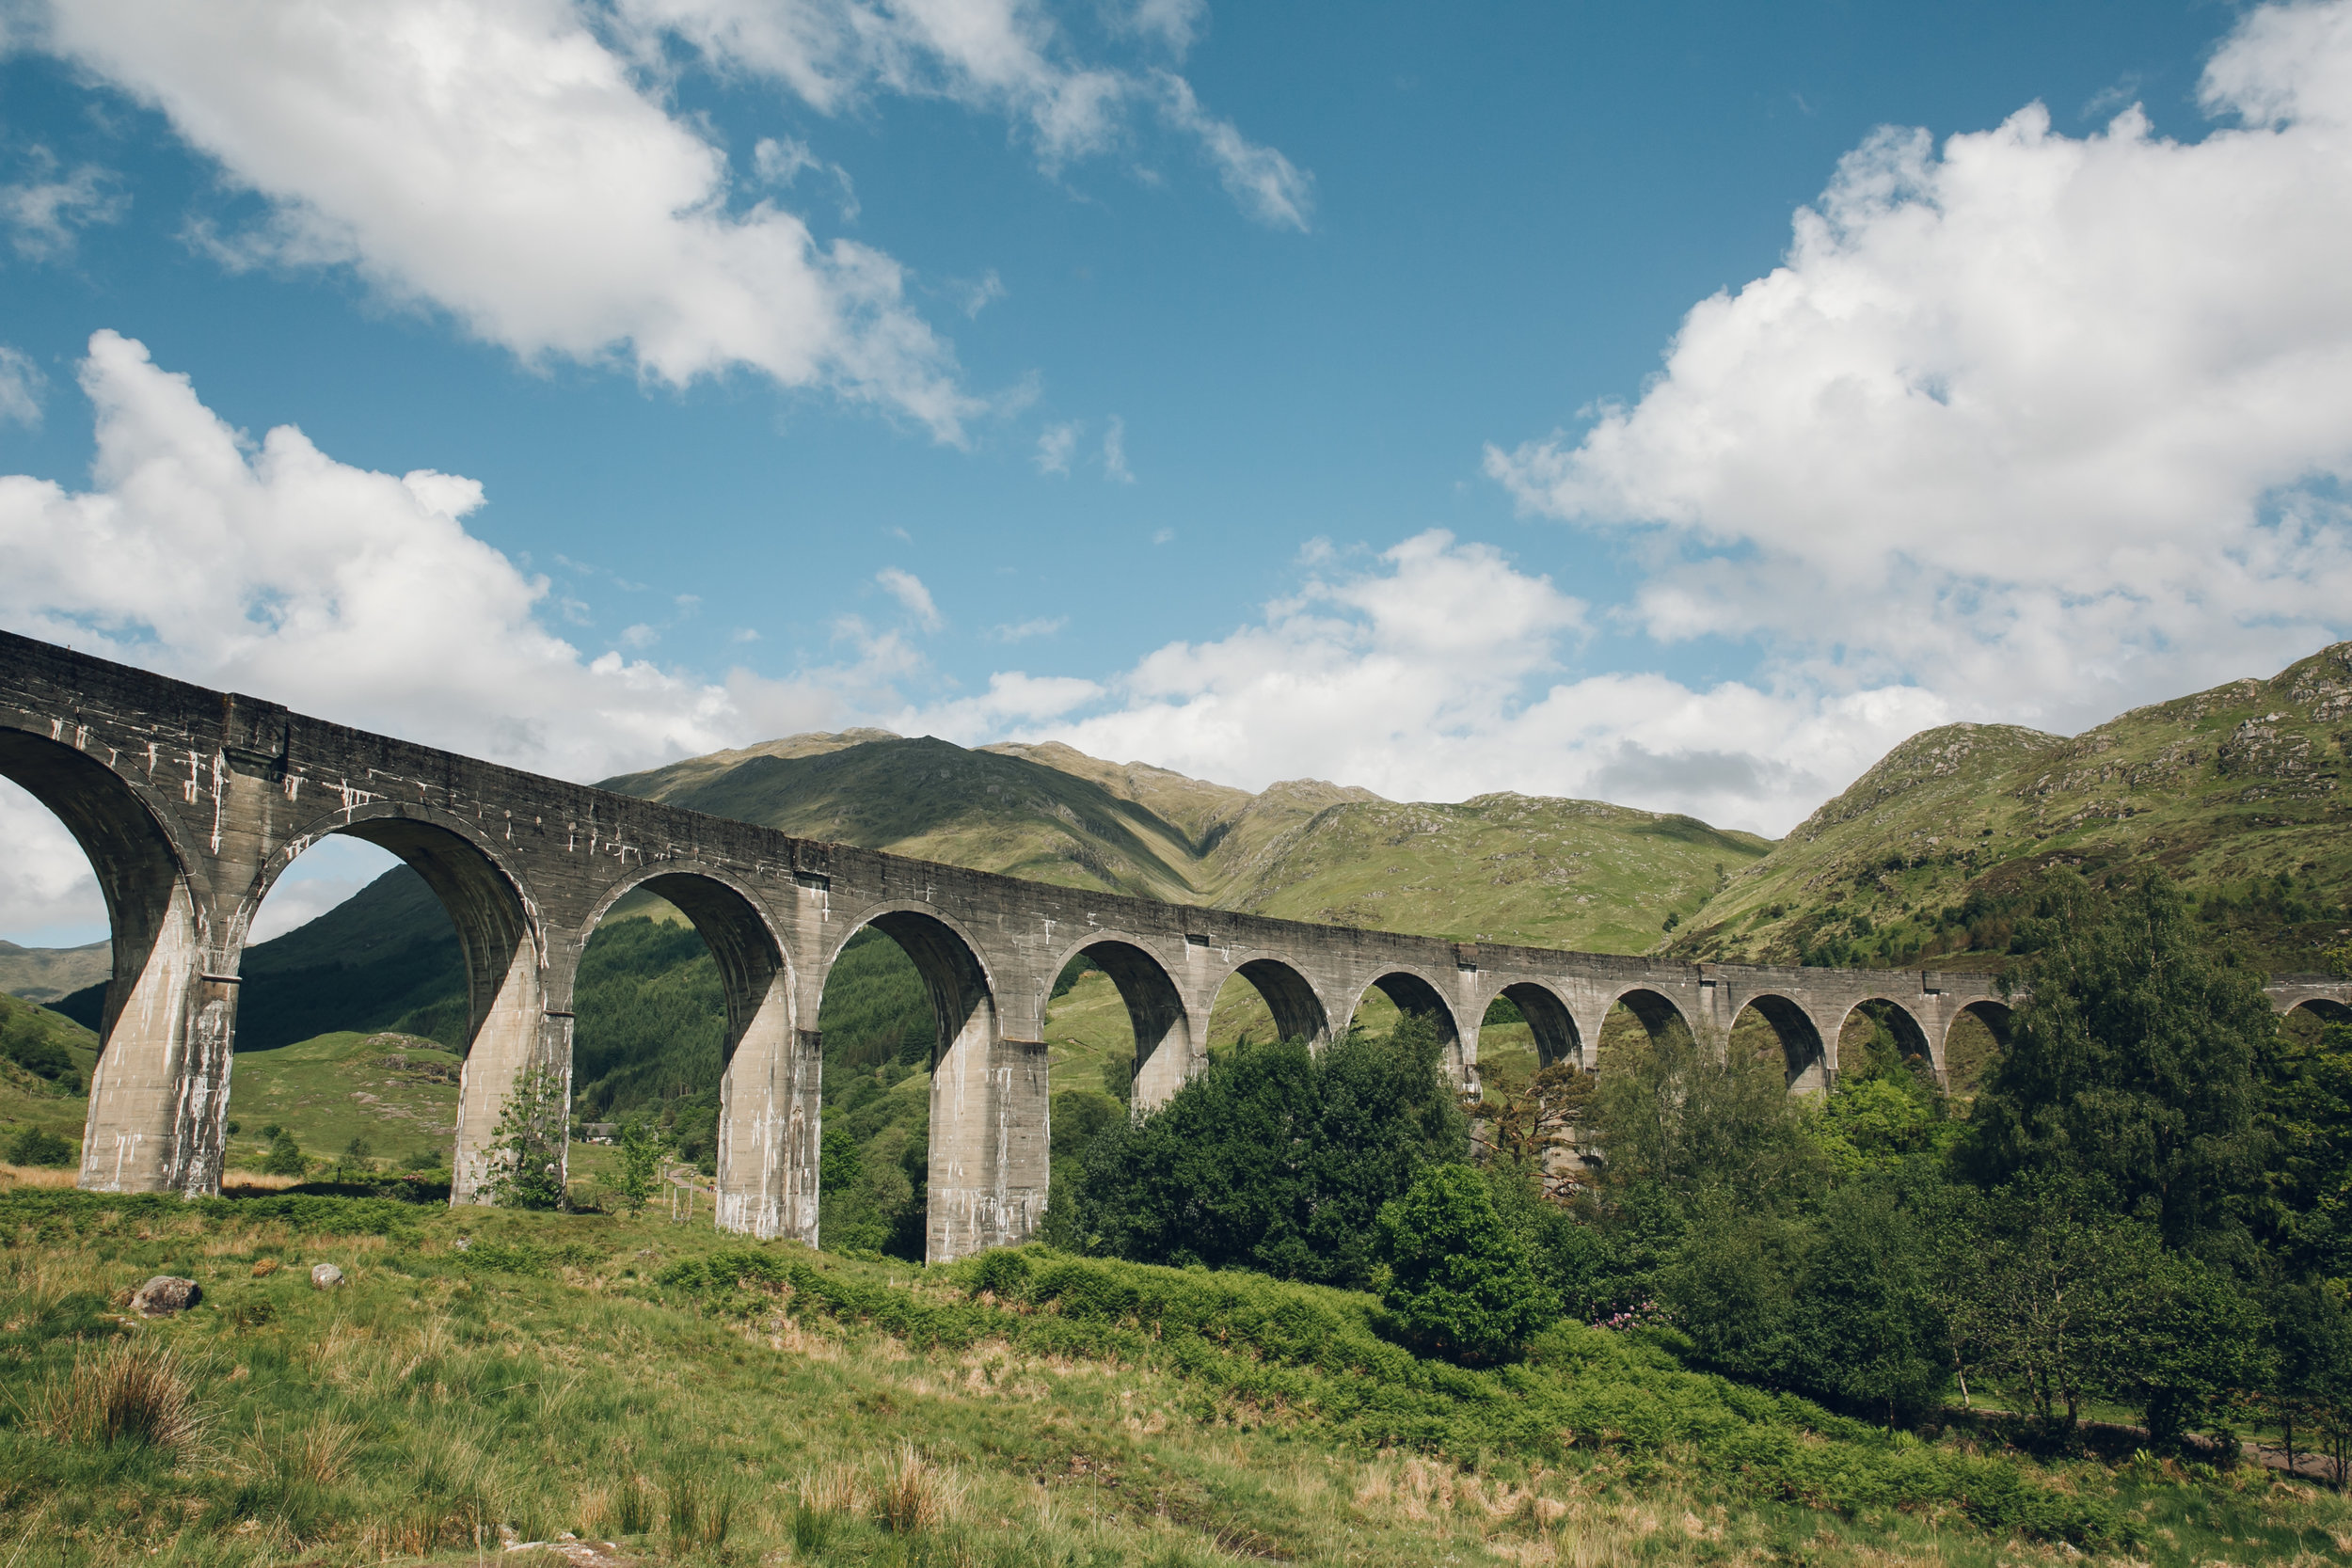 Scotland in the Summer - Glenfinnan Viaduct.